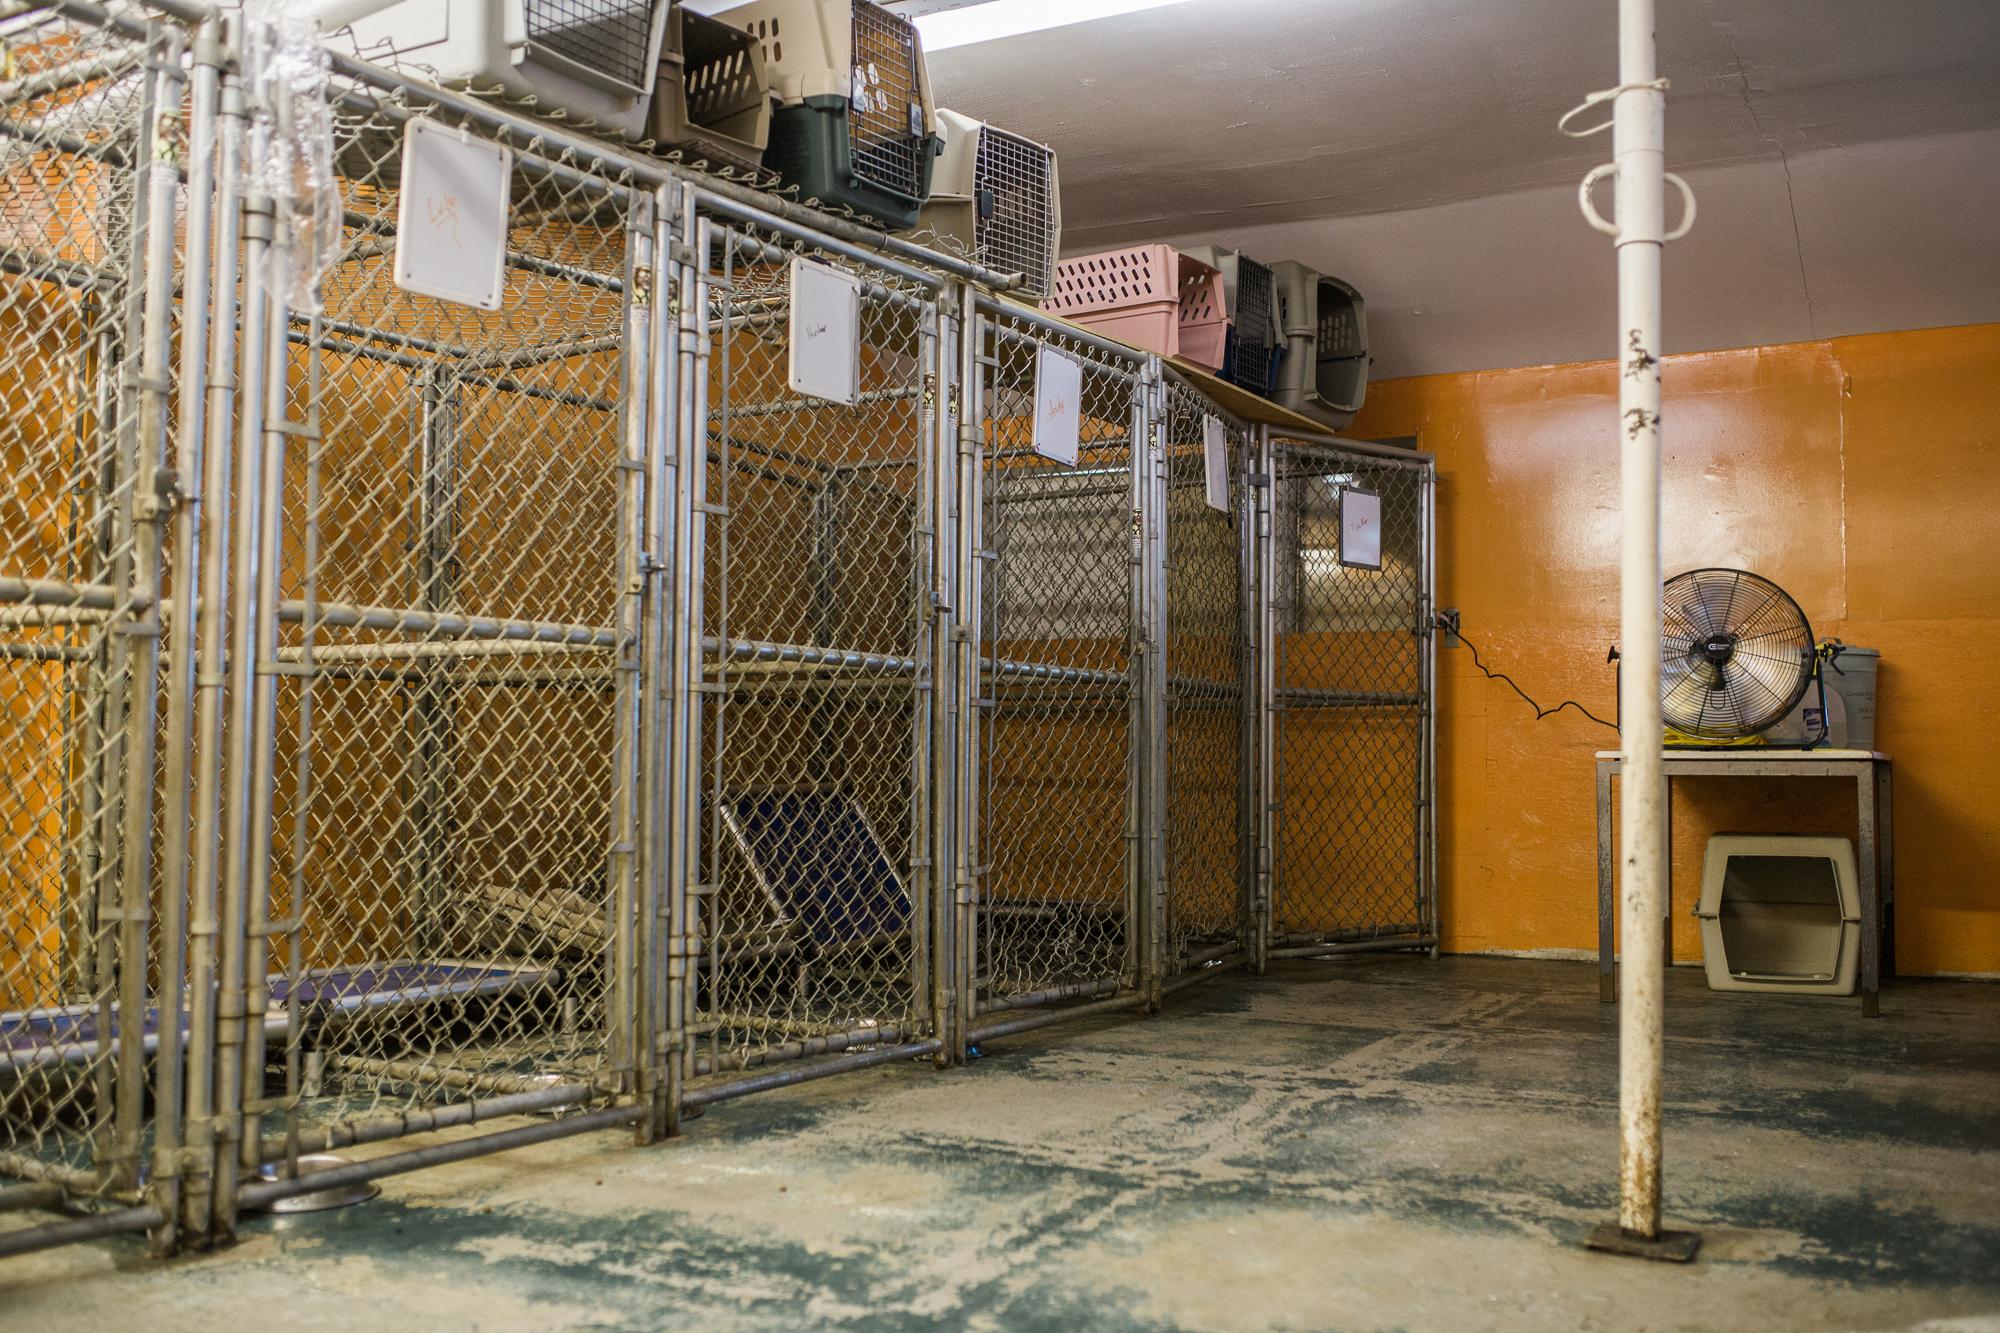 Barking-Good-Facility-18.jpg